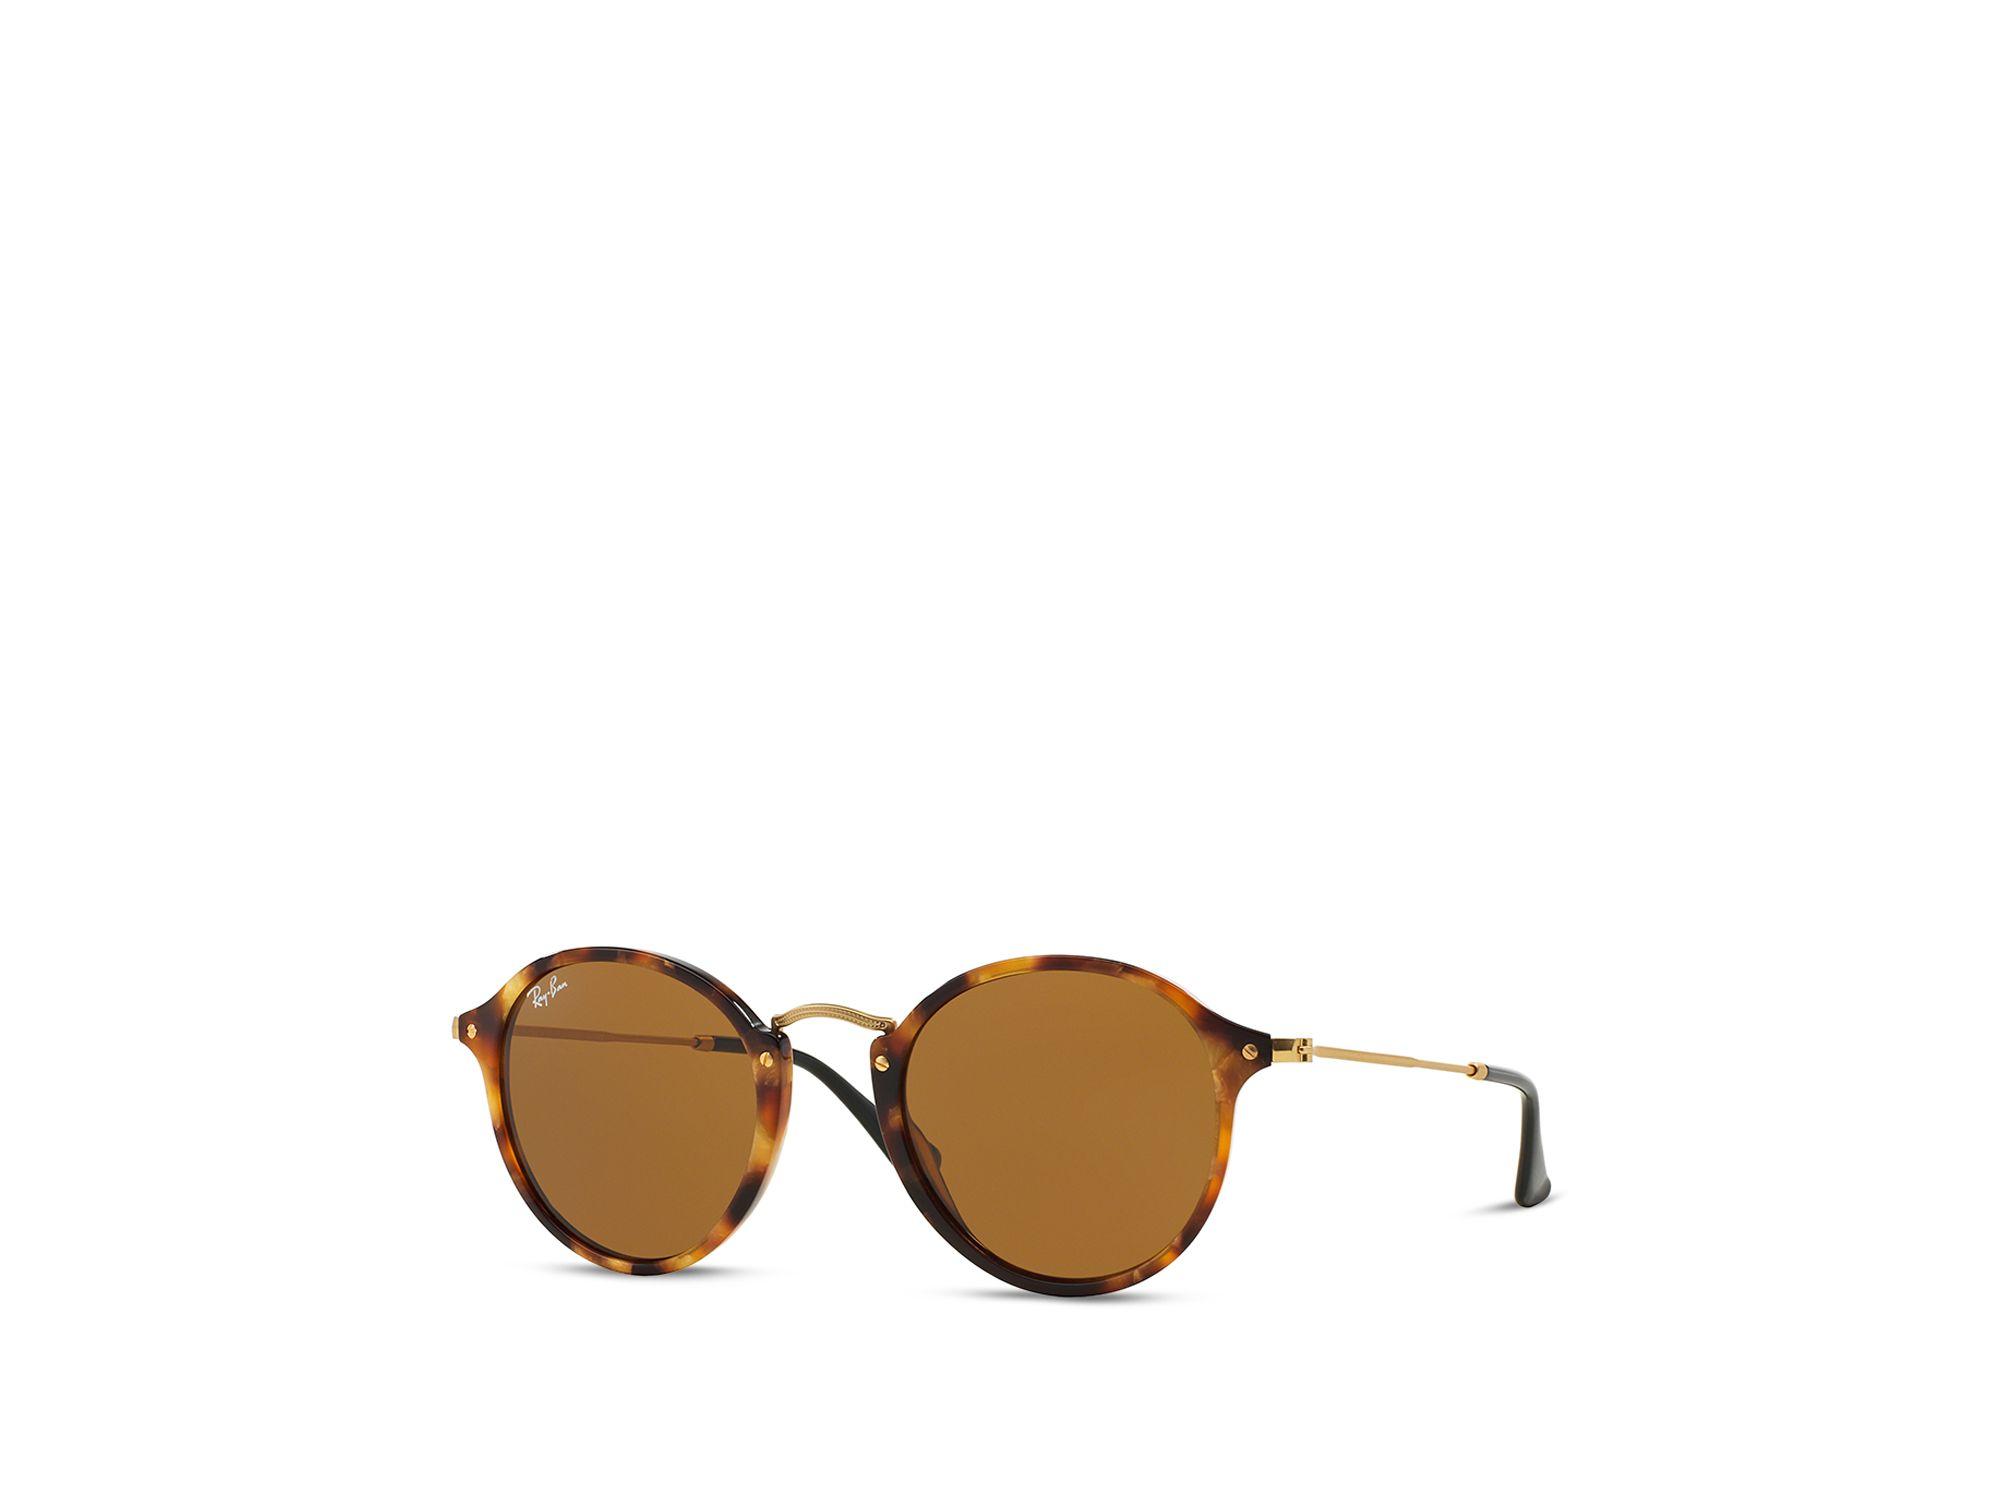 c3ed29bc02 Vintage Ray Ban Aviator Sunglasses Brown